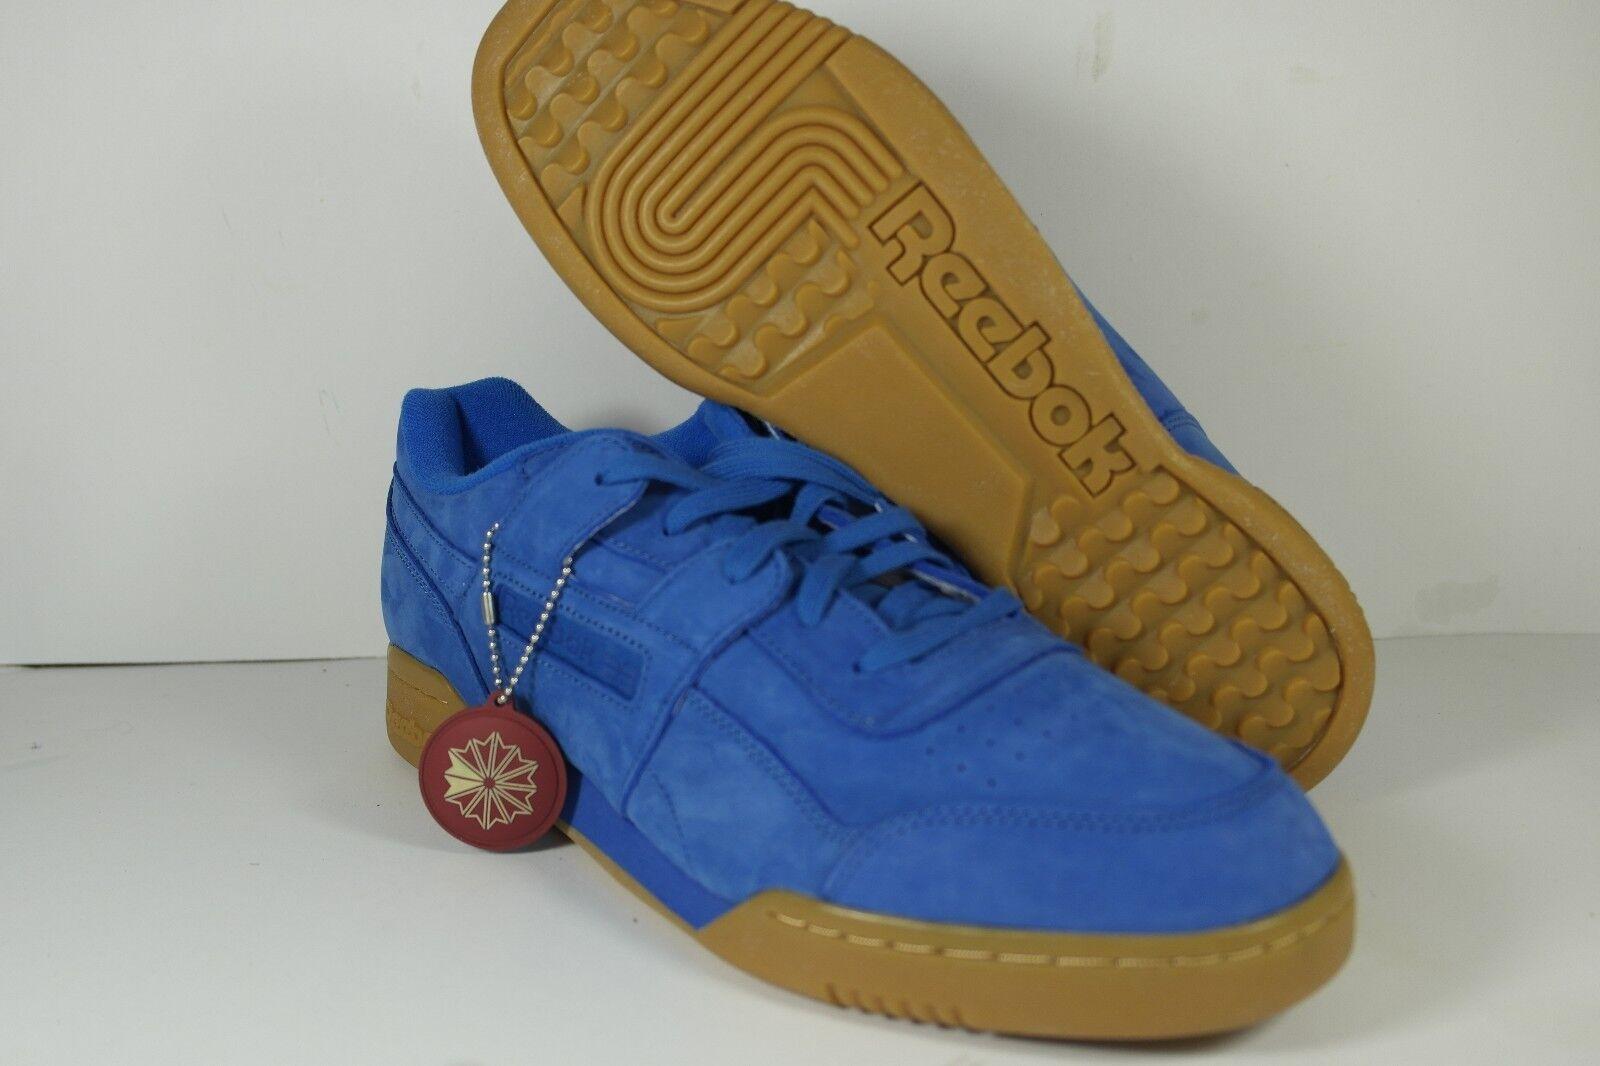 Reebok x Packer Shoes Workout Plus Blue Suede